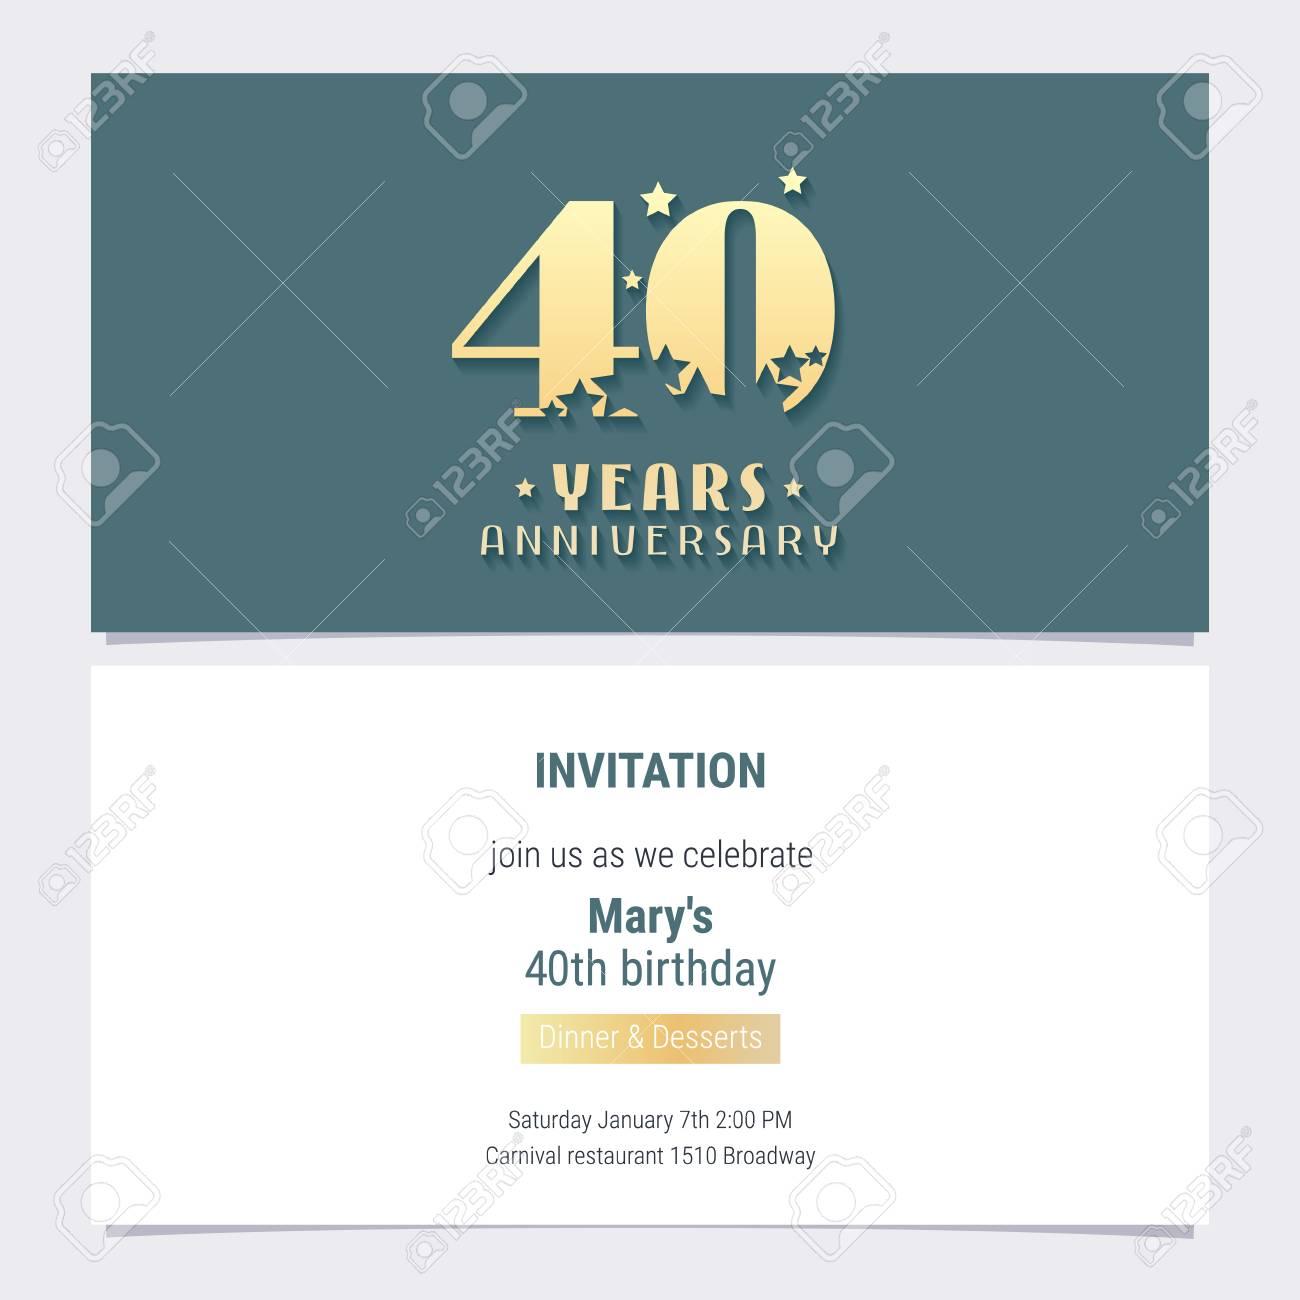 40 years anniversary invitation vector royalty free cliparts 40 years anniversary invitation vector banco de imagens 104381099 stopboris Image collections